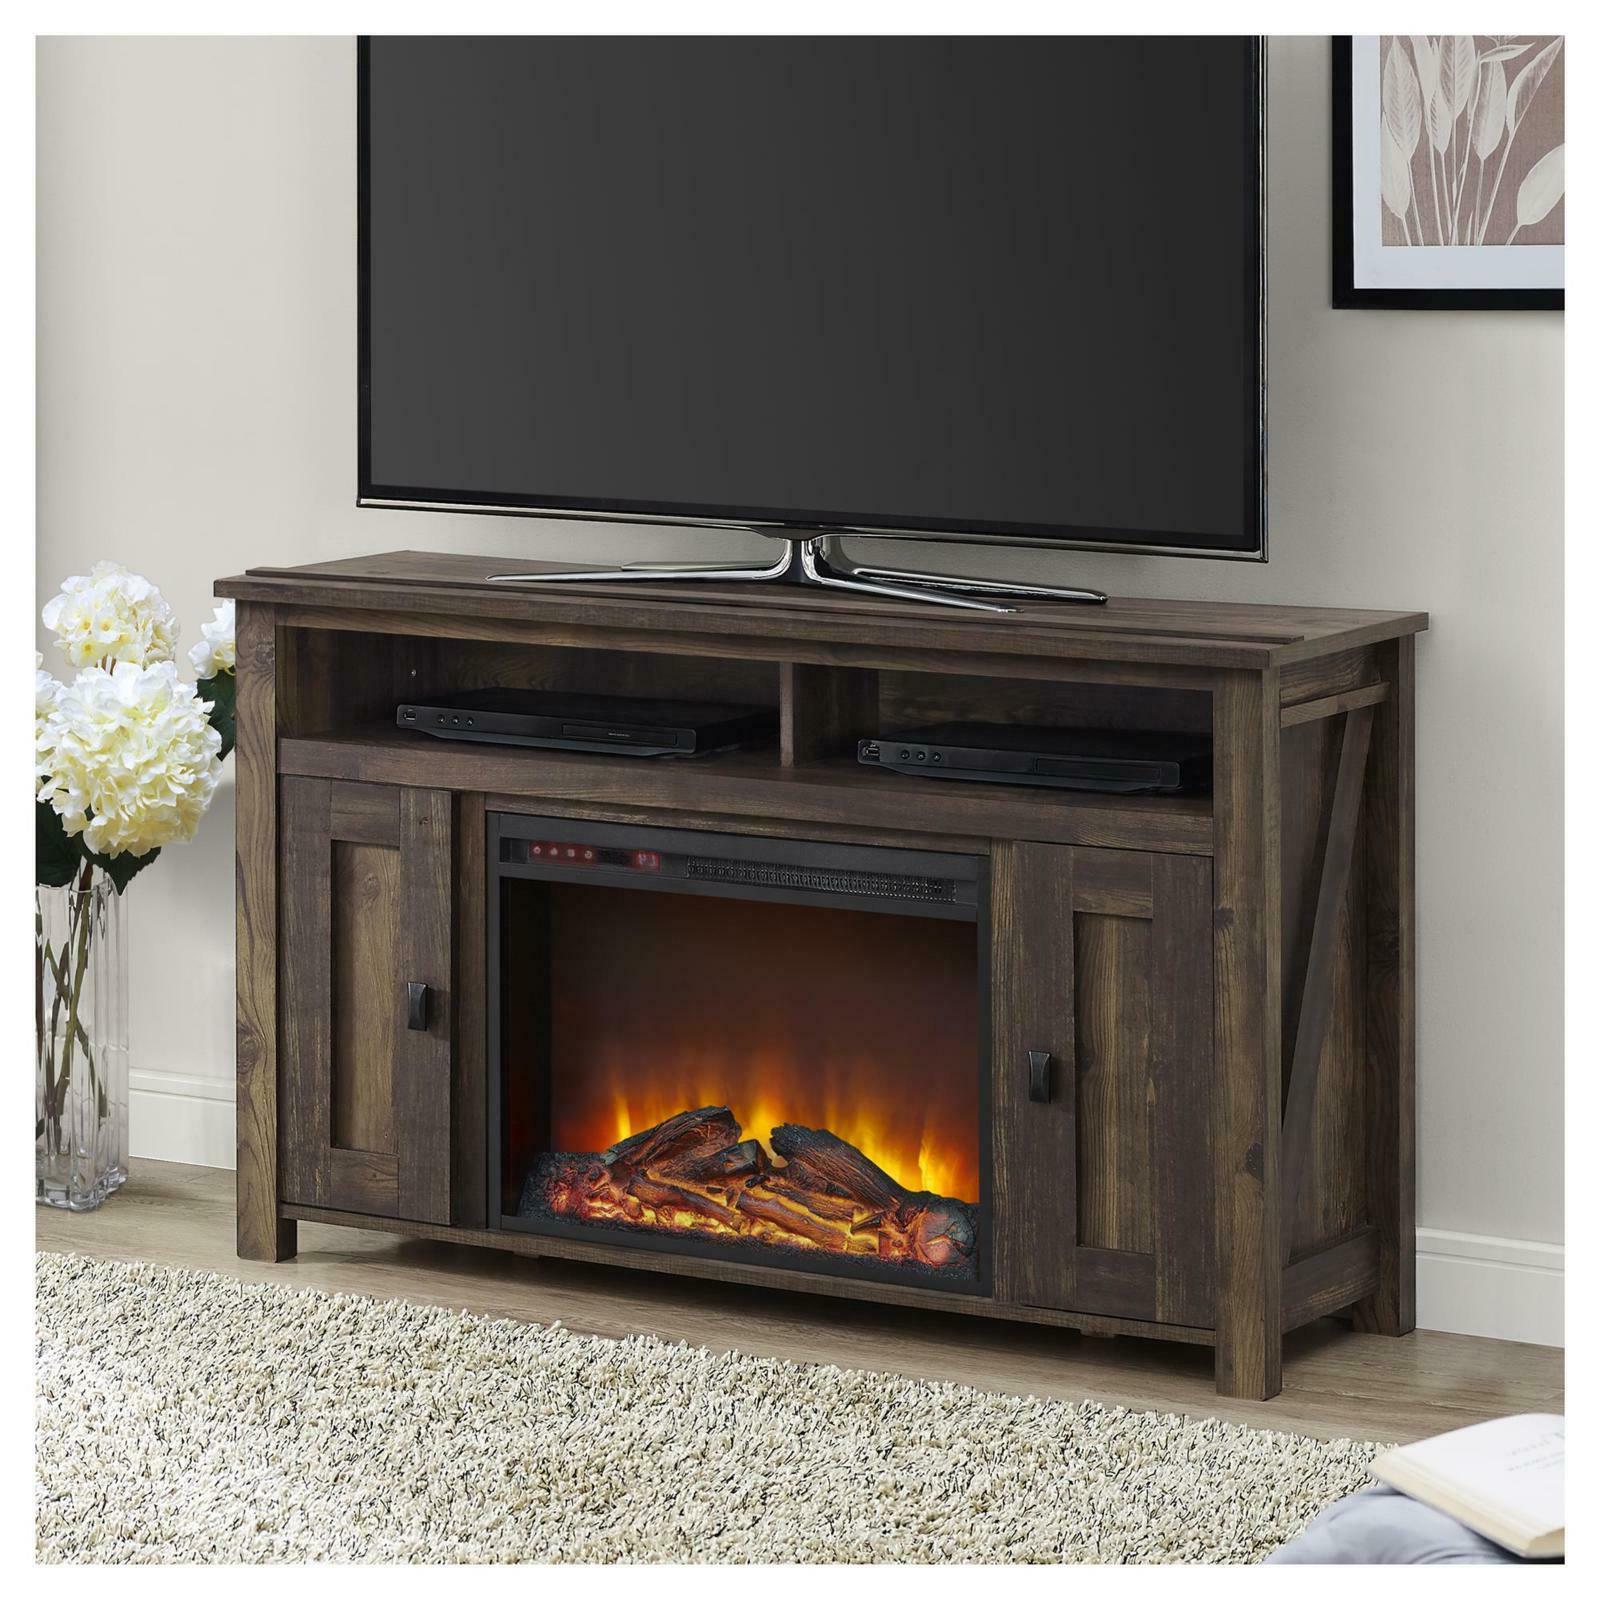 farmington media heritage pine fireplace